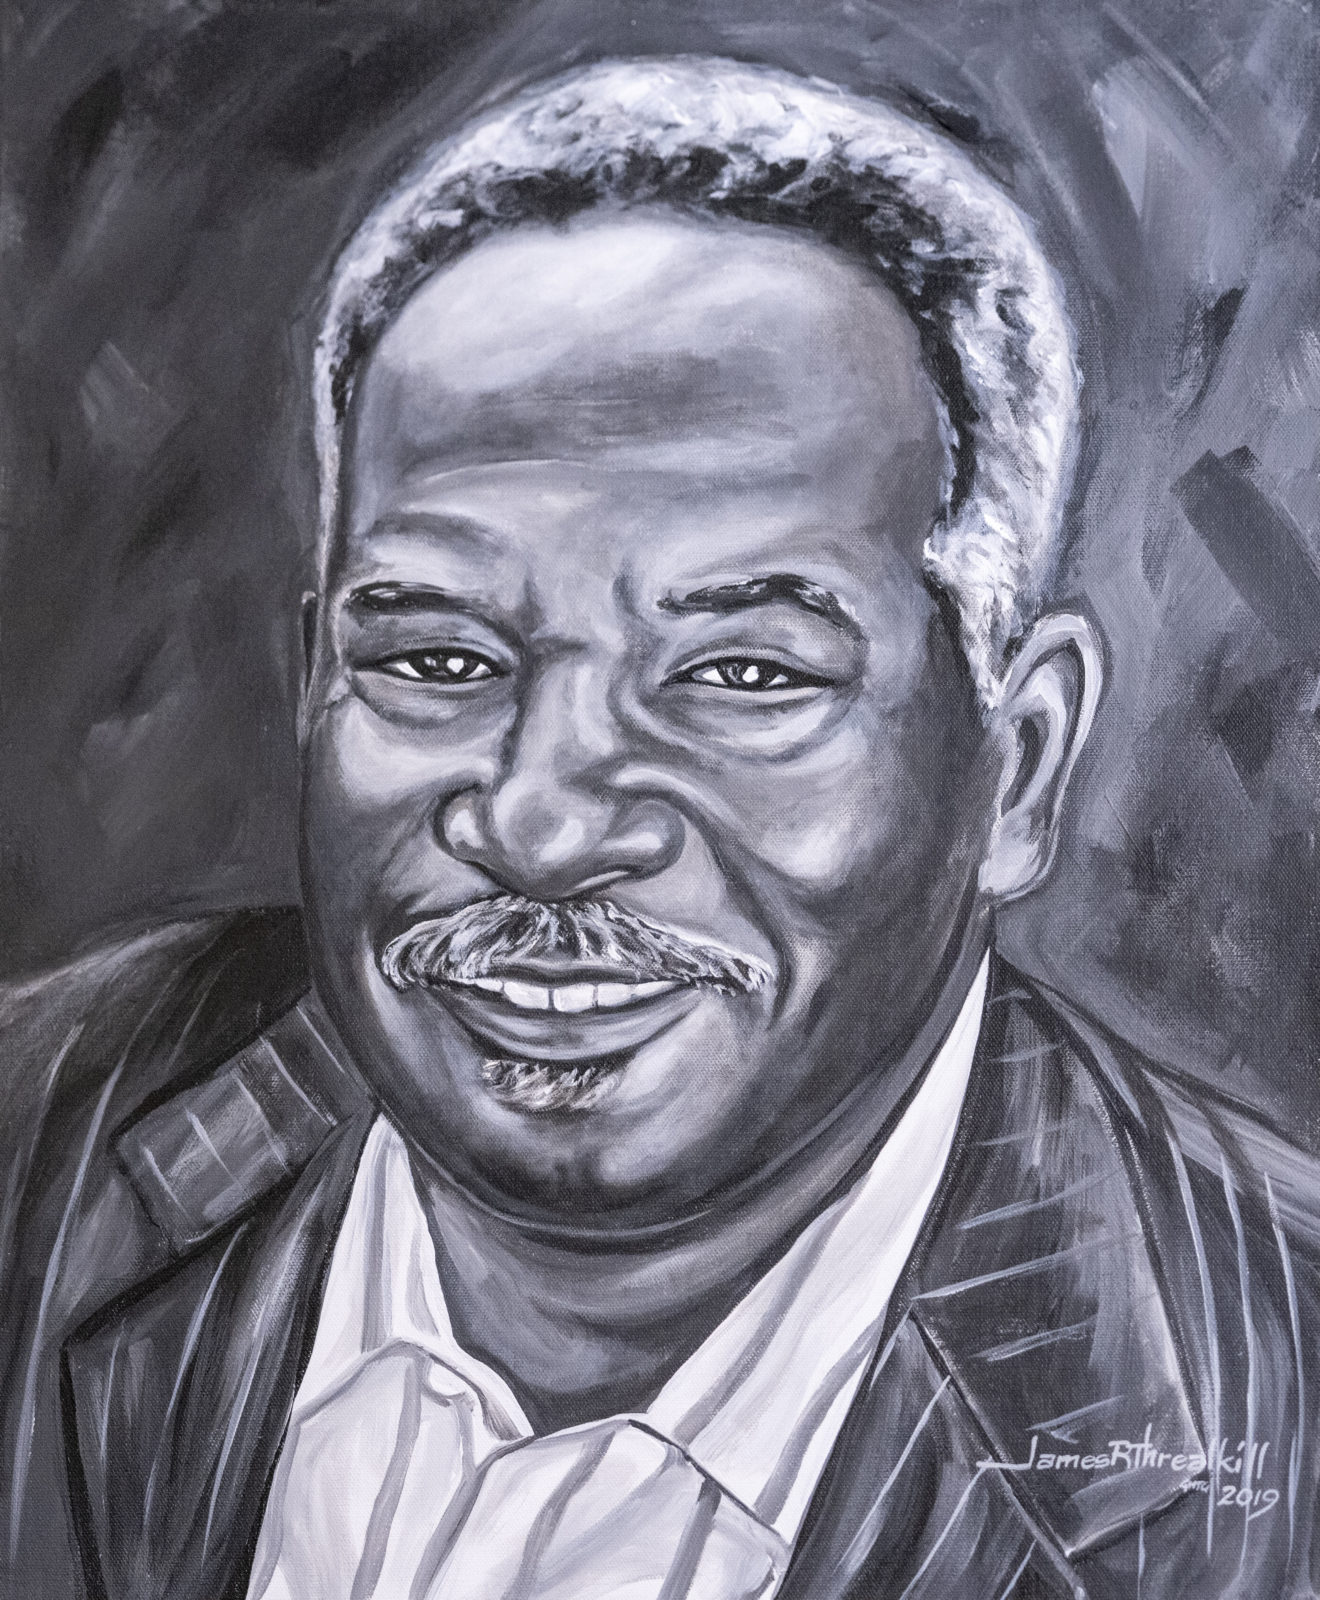 Legacy Pioneer Portrait of David Williams II by James Threalkill. (John Russell/Vanderbilt University)